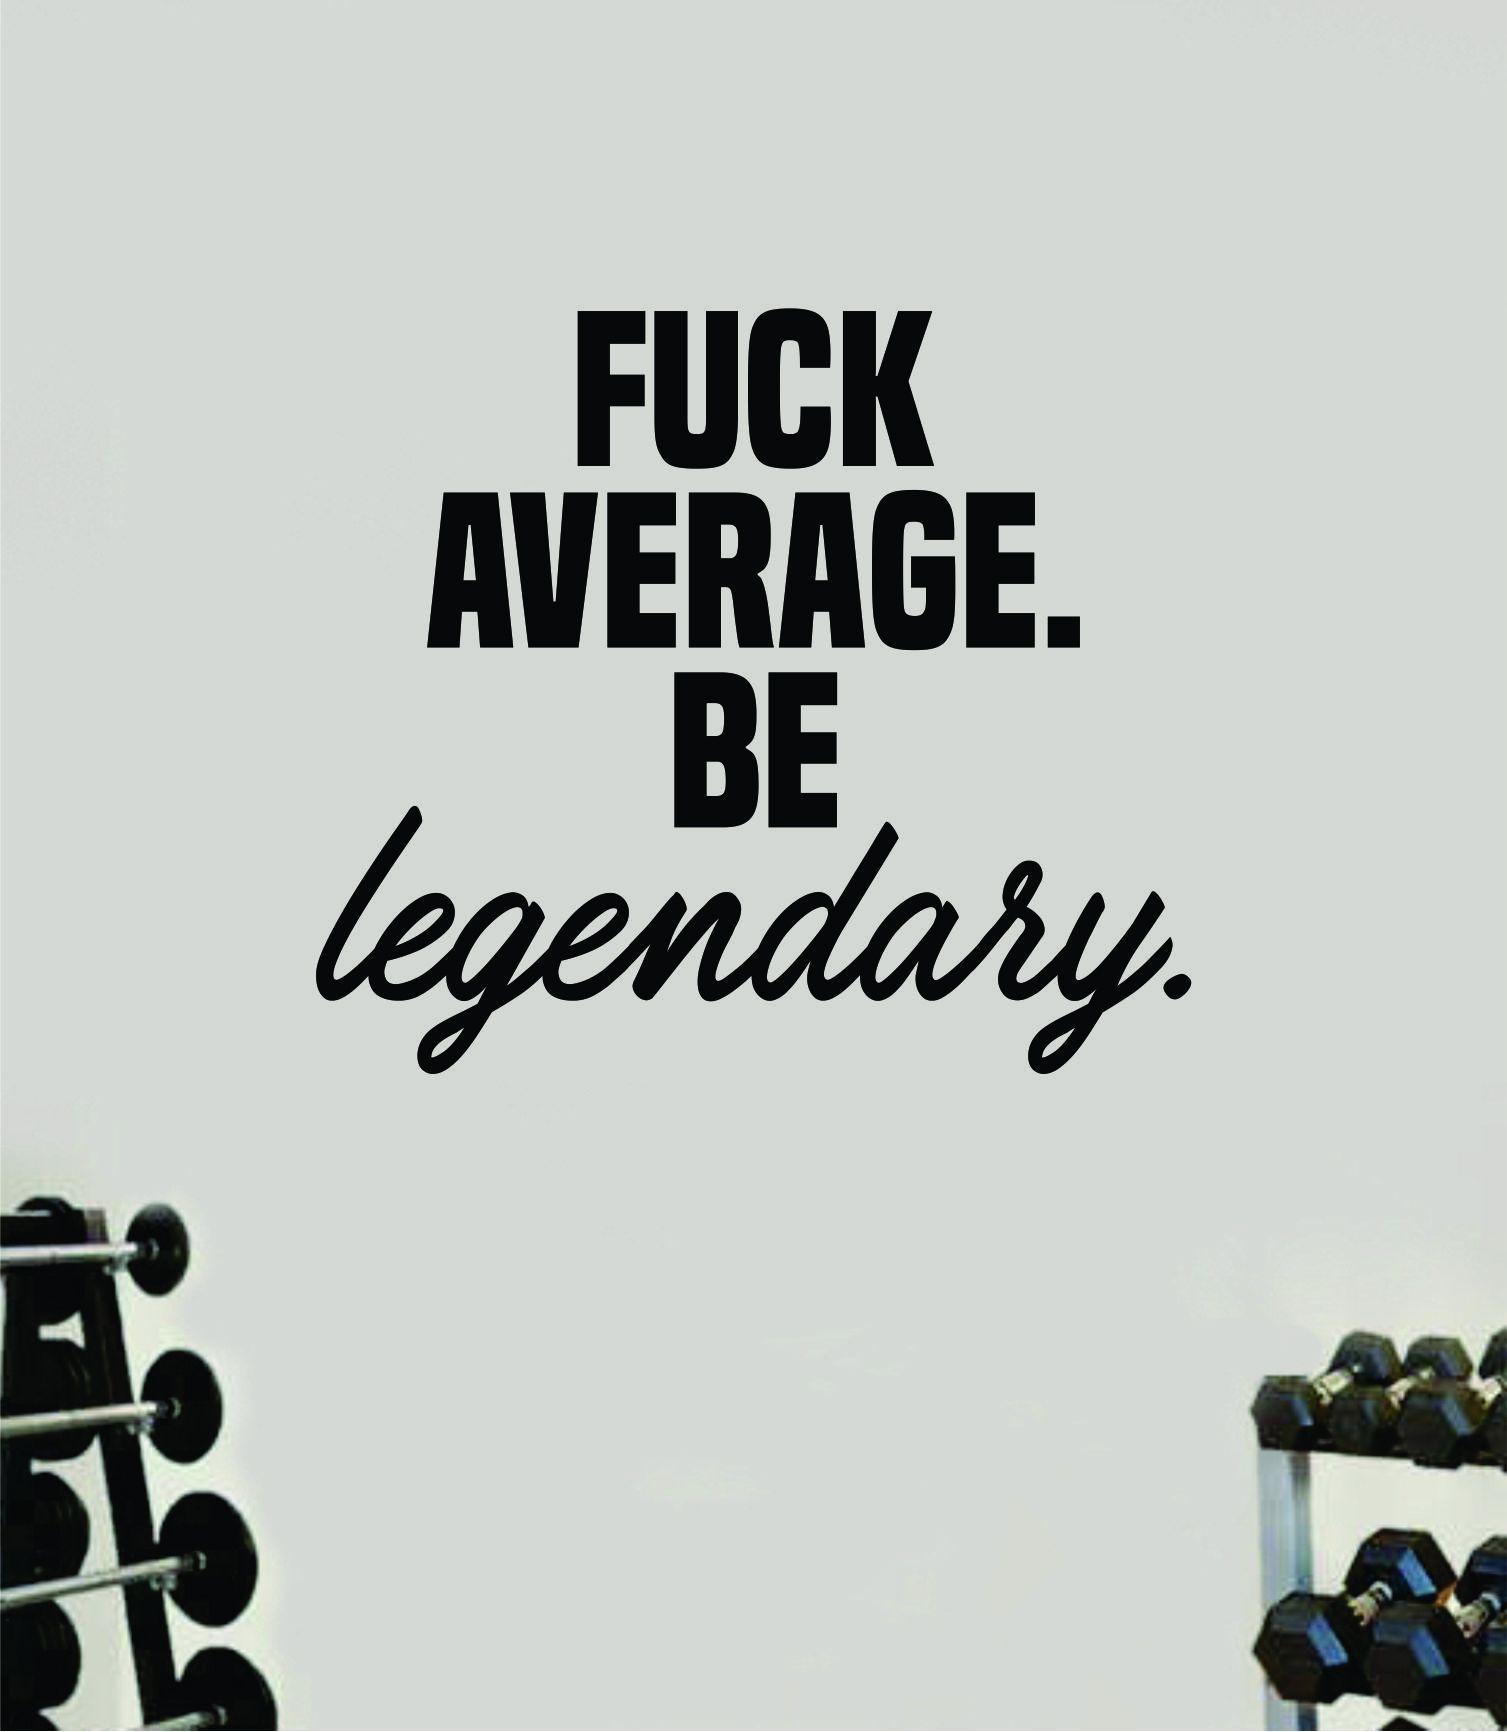 F Average Be Legendary V2 Decal Sticker Wall Vinyl Art Wall Bedroom Room Home Decor Inspirational Motivational Teen Sports Gym Fitness - vivid blue